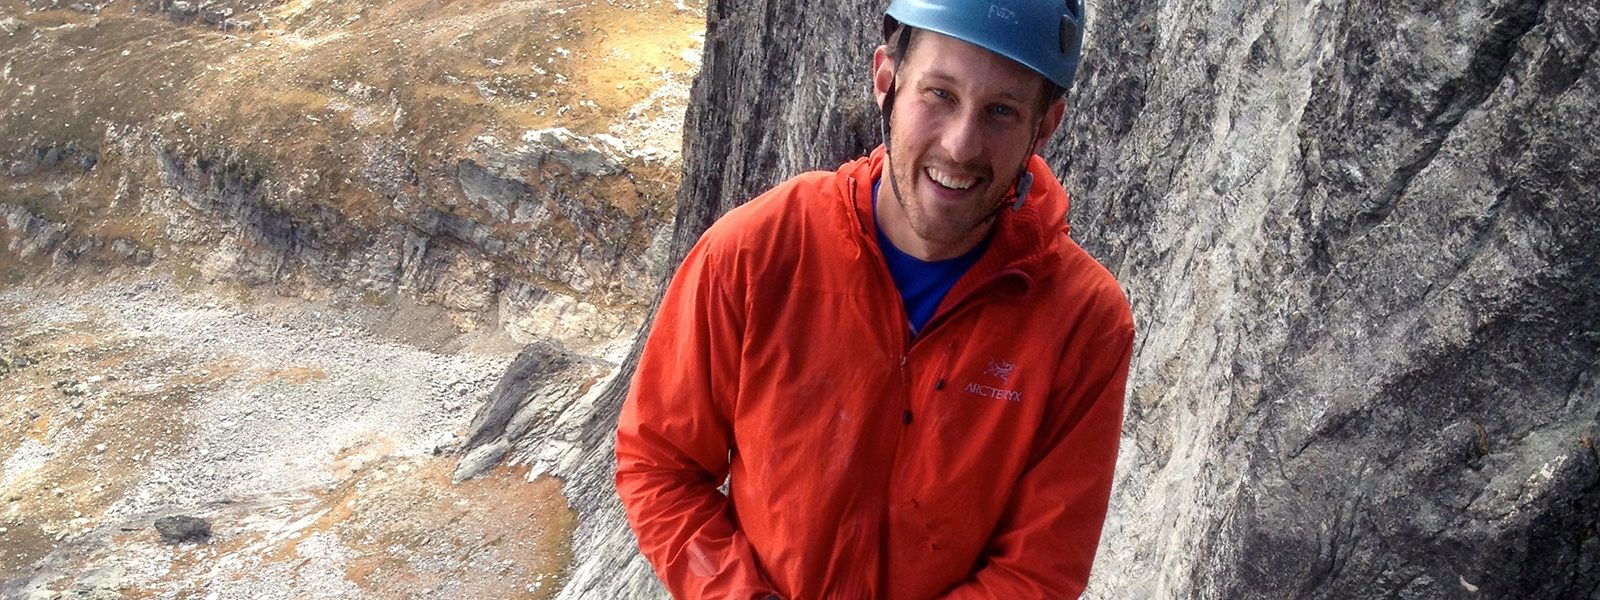 Northland College alum Jason Luthy on a climb